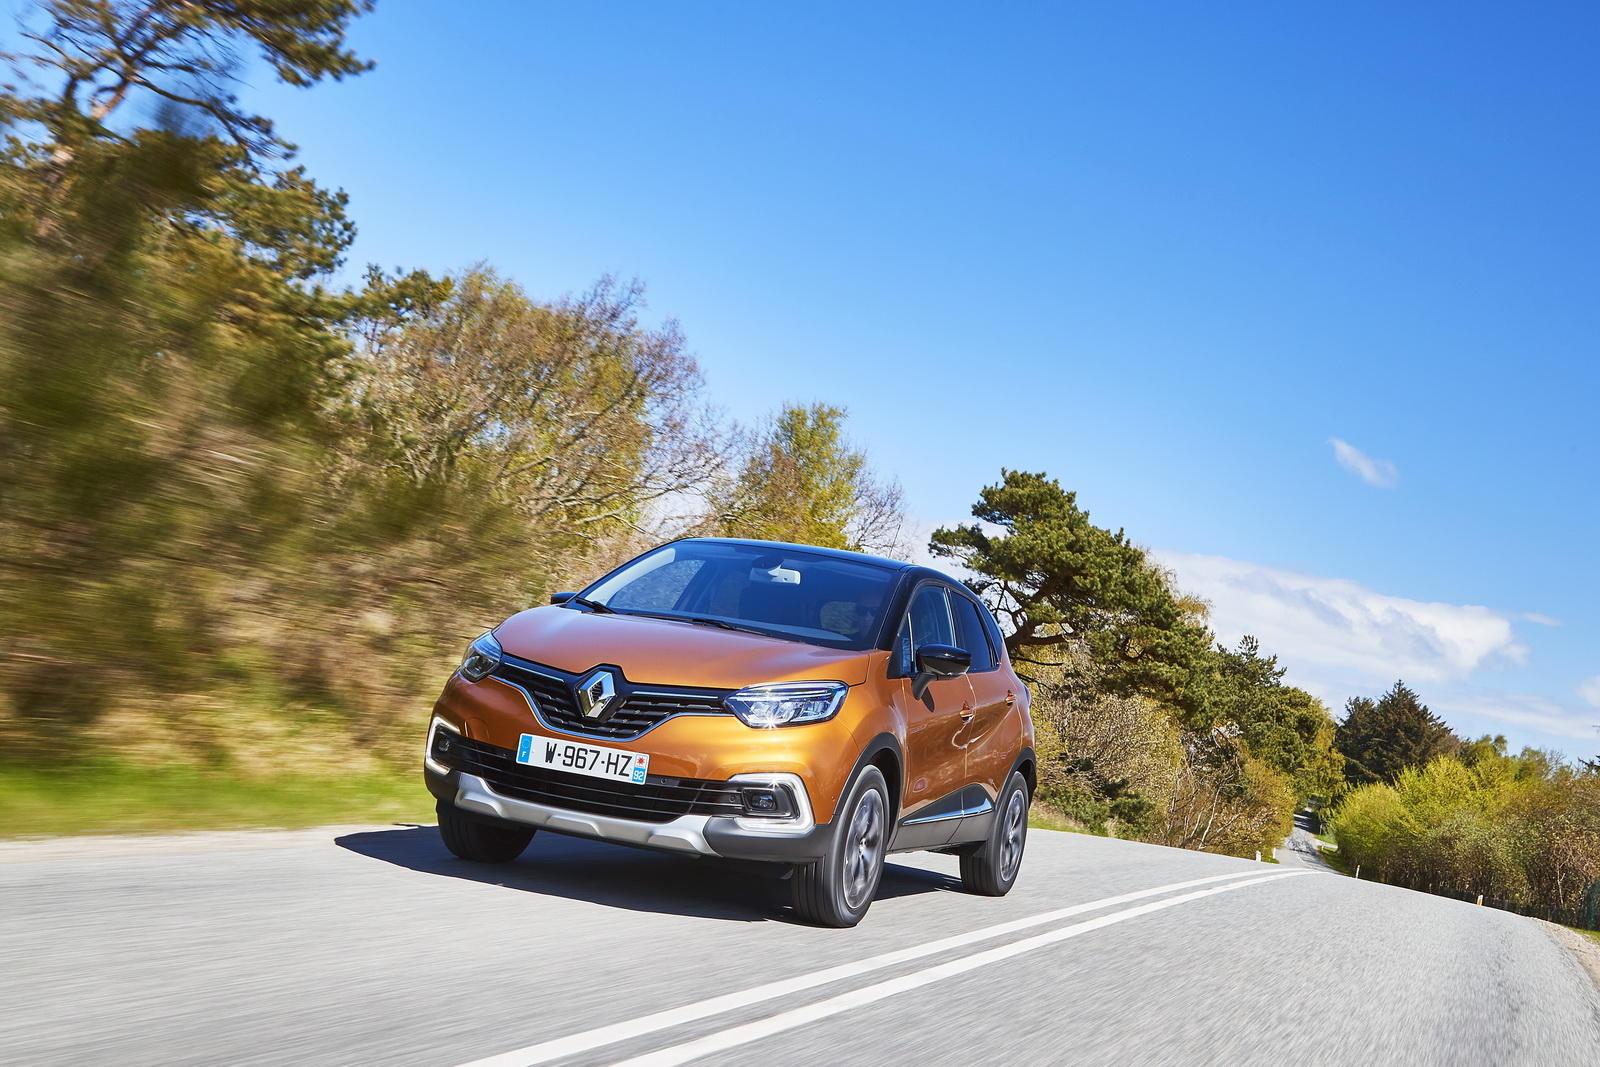 Renault Captur facelift - Renault Captur facelift